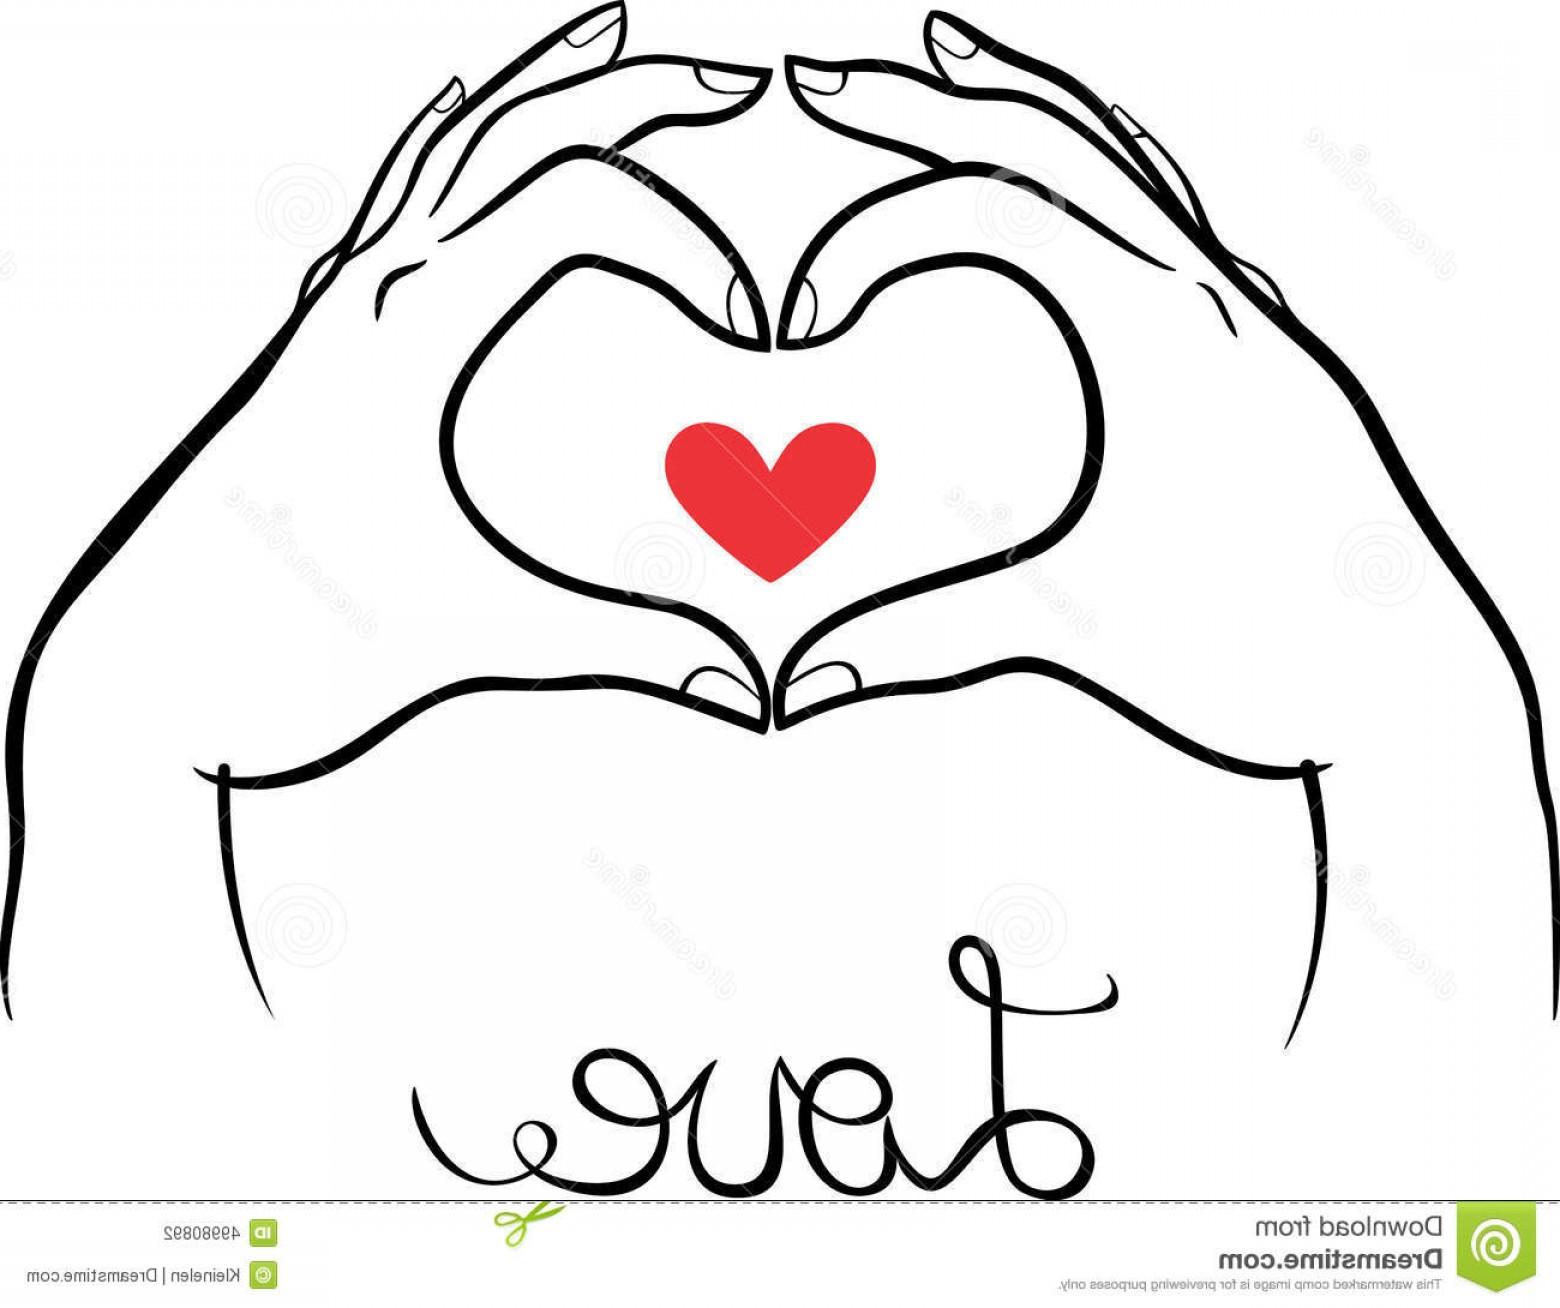 1560x1308 Stock Illustration Hands Making Heart Gesture Vector Illustration